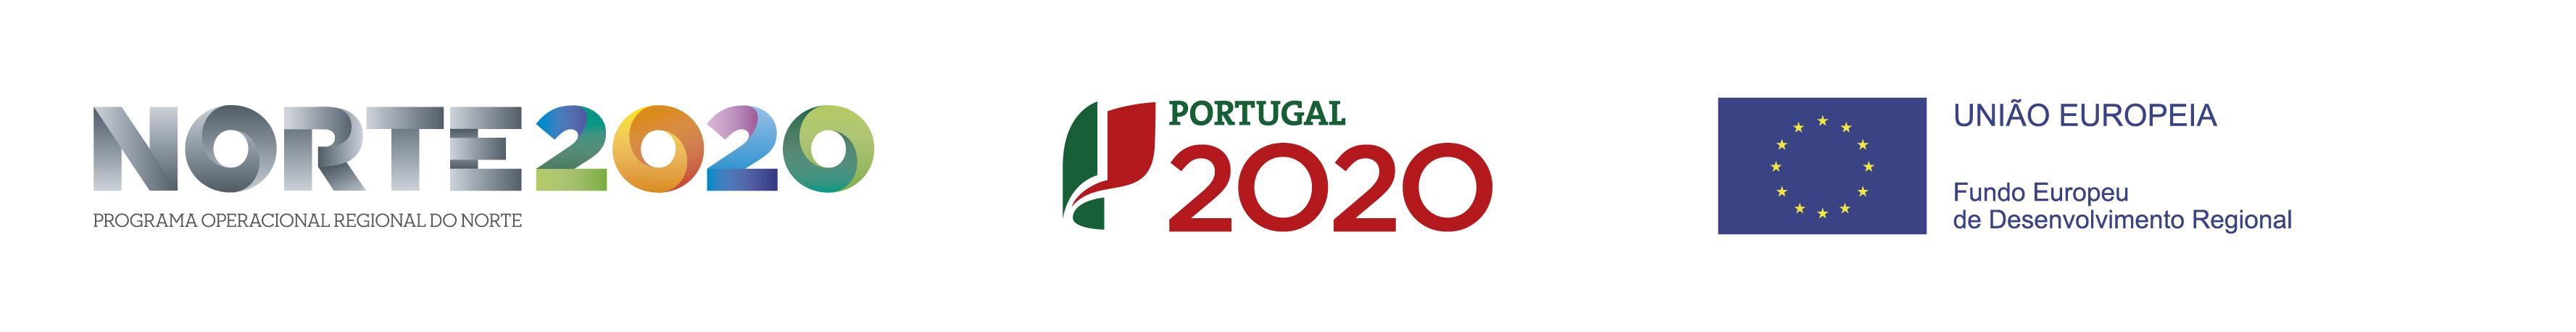 PT 2020